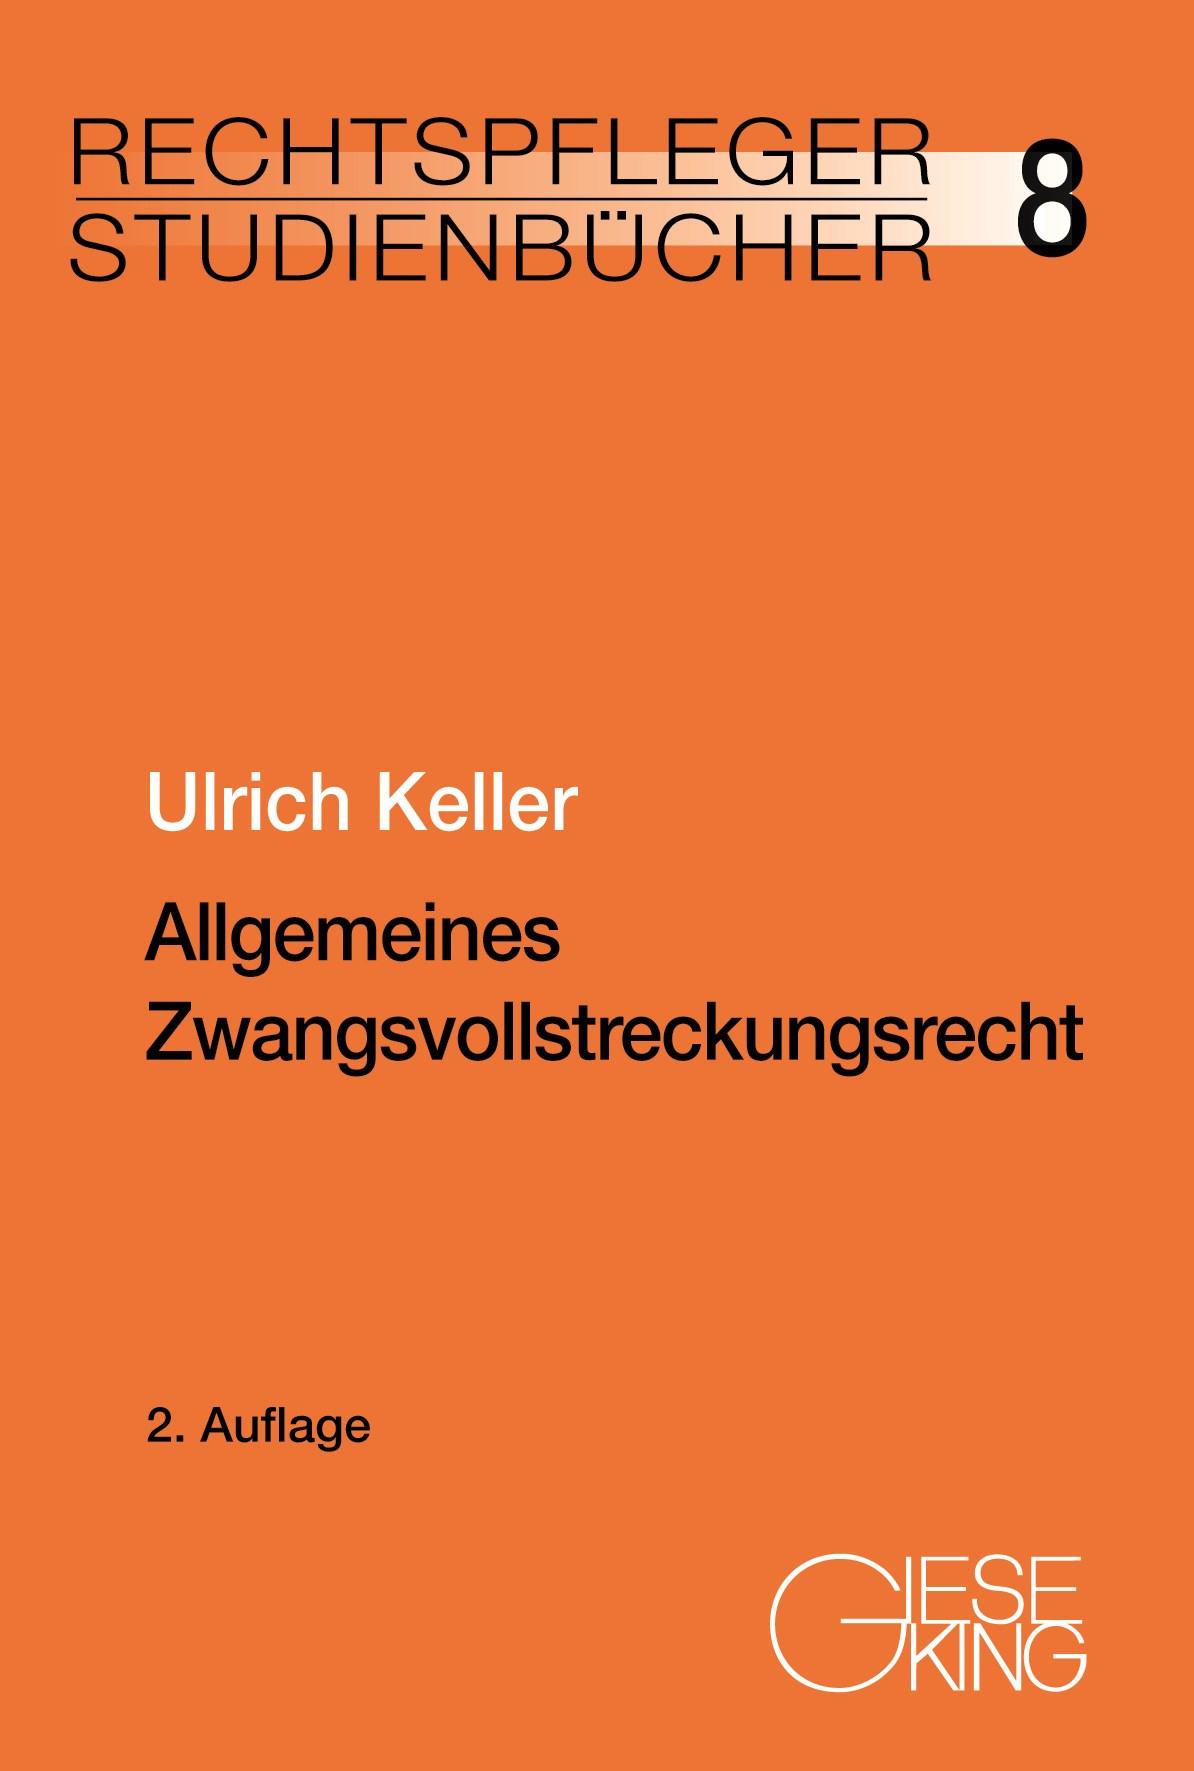 Allgemeines-Zwangsvollstreckungsrecht-Ulrich-Keller